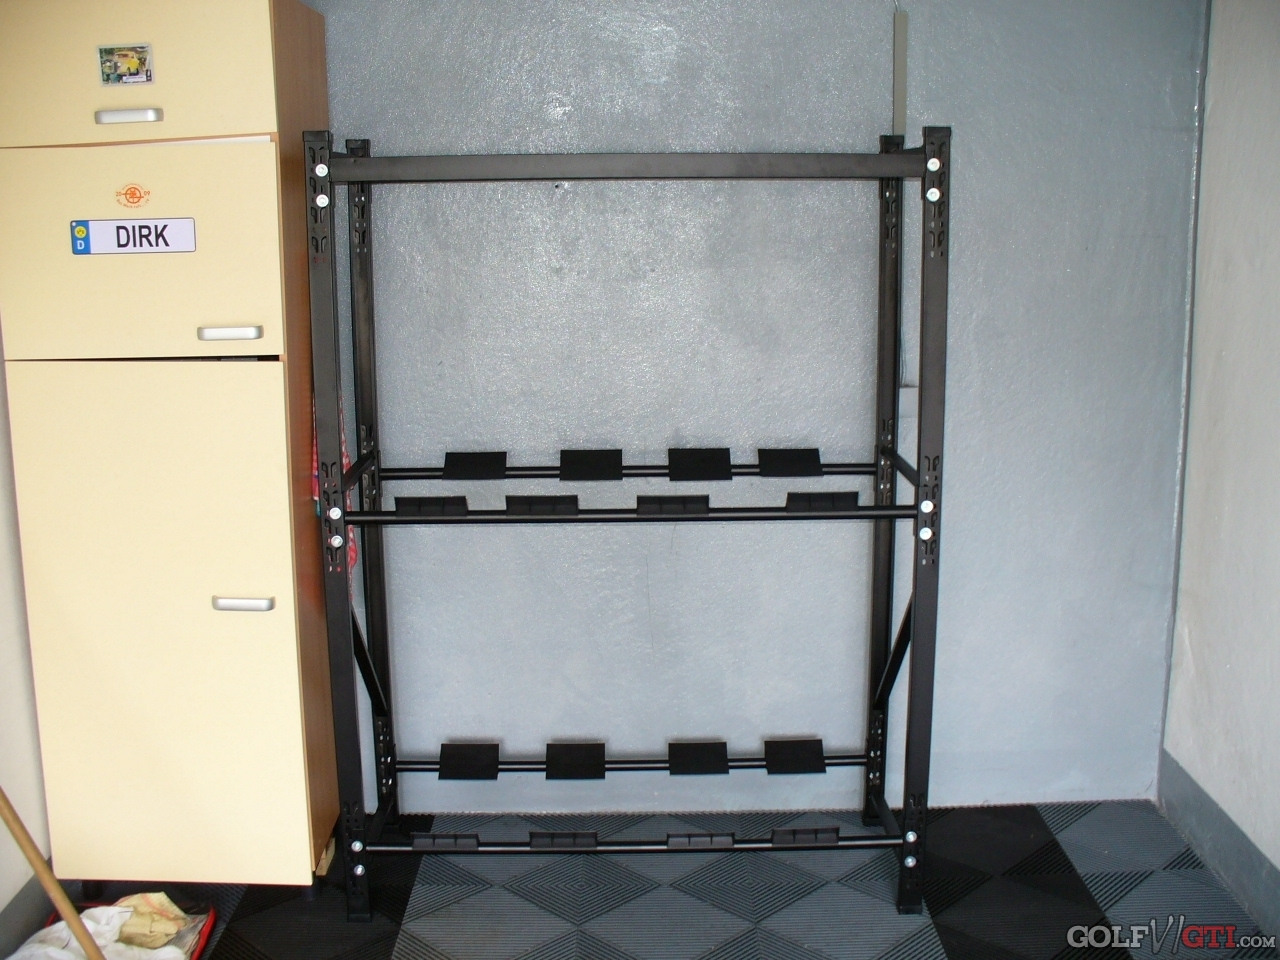 reifenst nder f r 8 reifen st nder reifen reifenhalter felgenbaum reifenst nder reifenregal. Black Bedroom Furniture Sets. Home Design Ideas